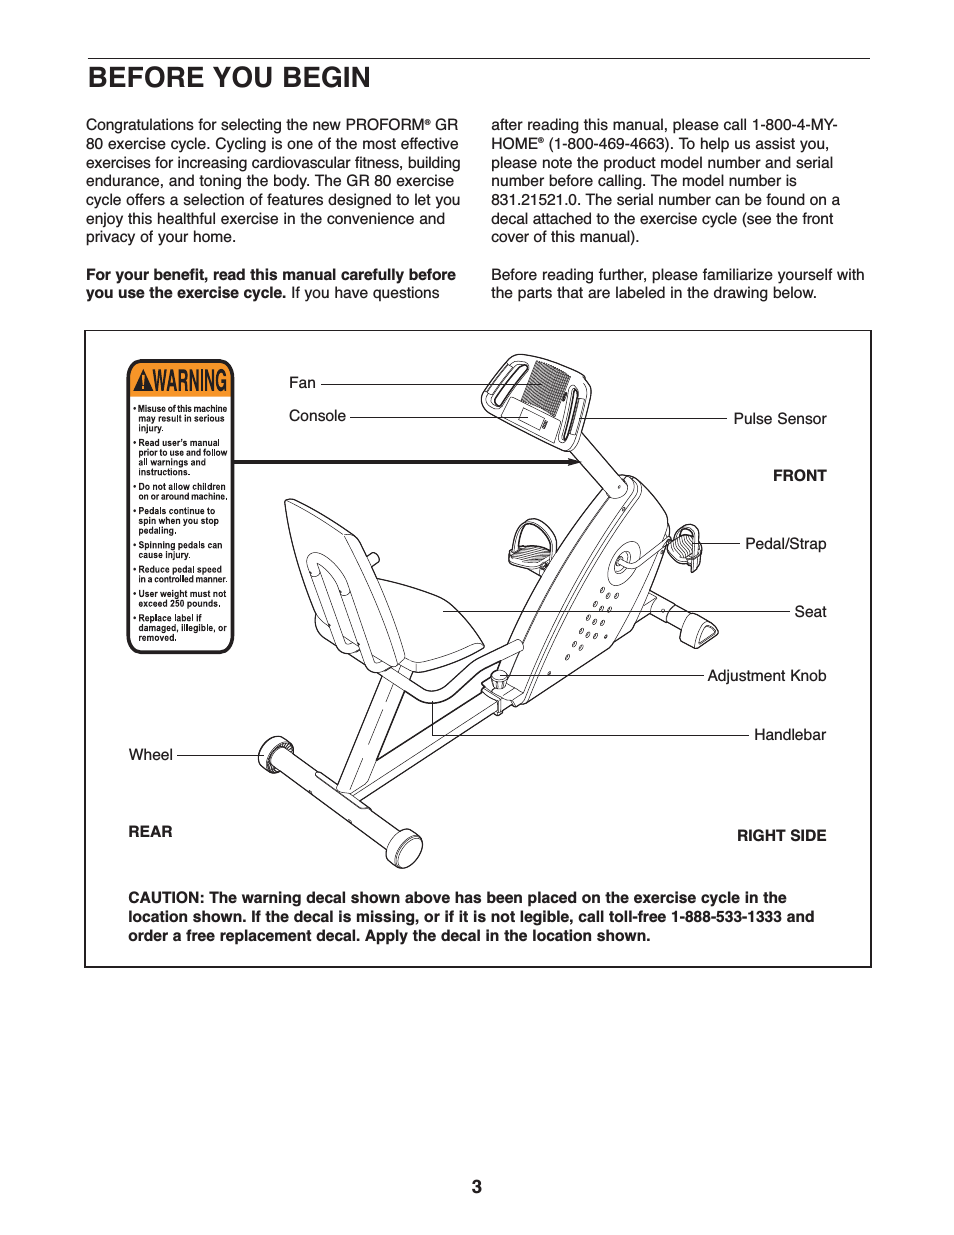 Proform Gr 80 Parts